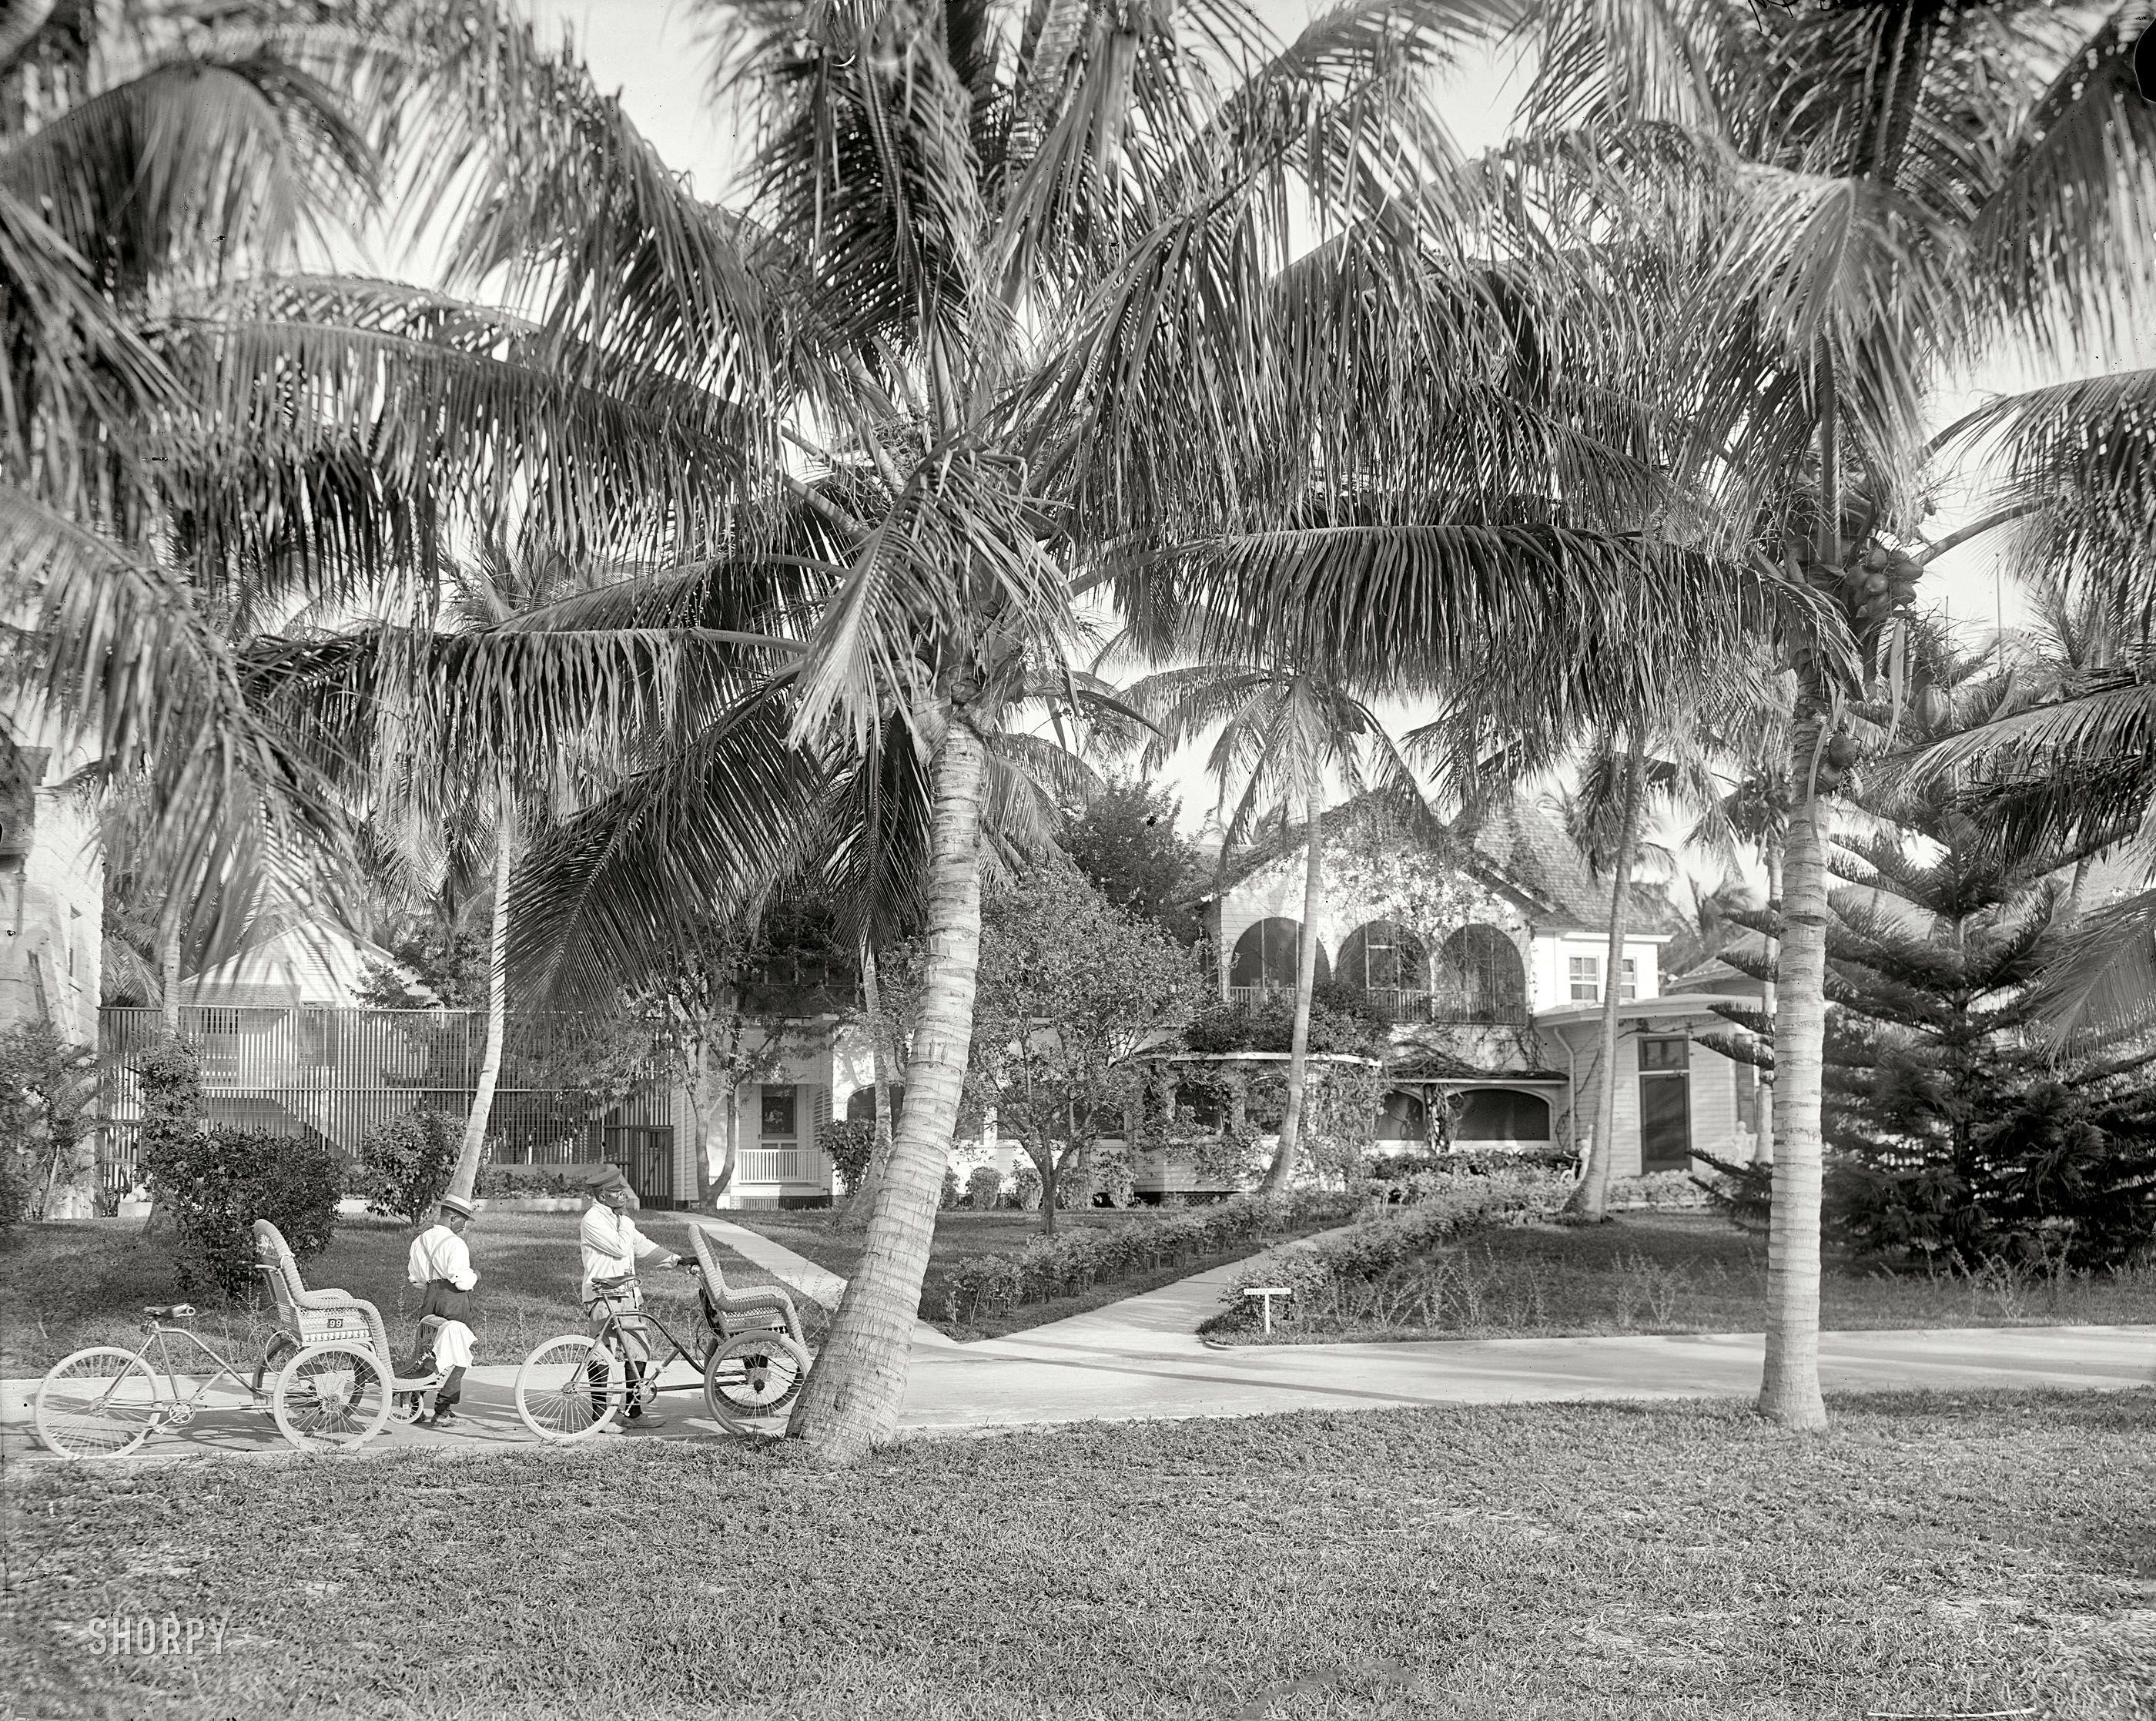 Shorpy Historical Photo Archive West Palm Beach Florida Circa 1910 Beach Club Subtropical Sou West Palm Beach West Palm Beach Florida Florida Pictures